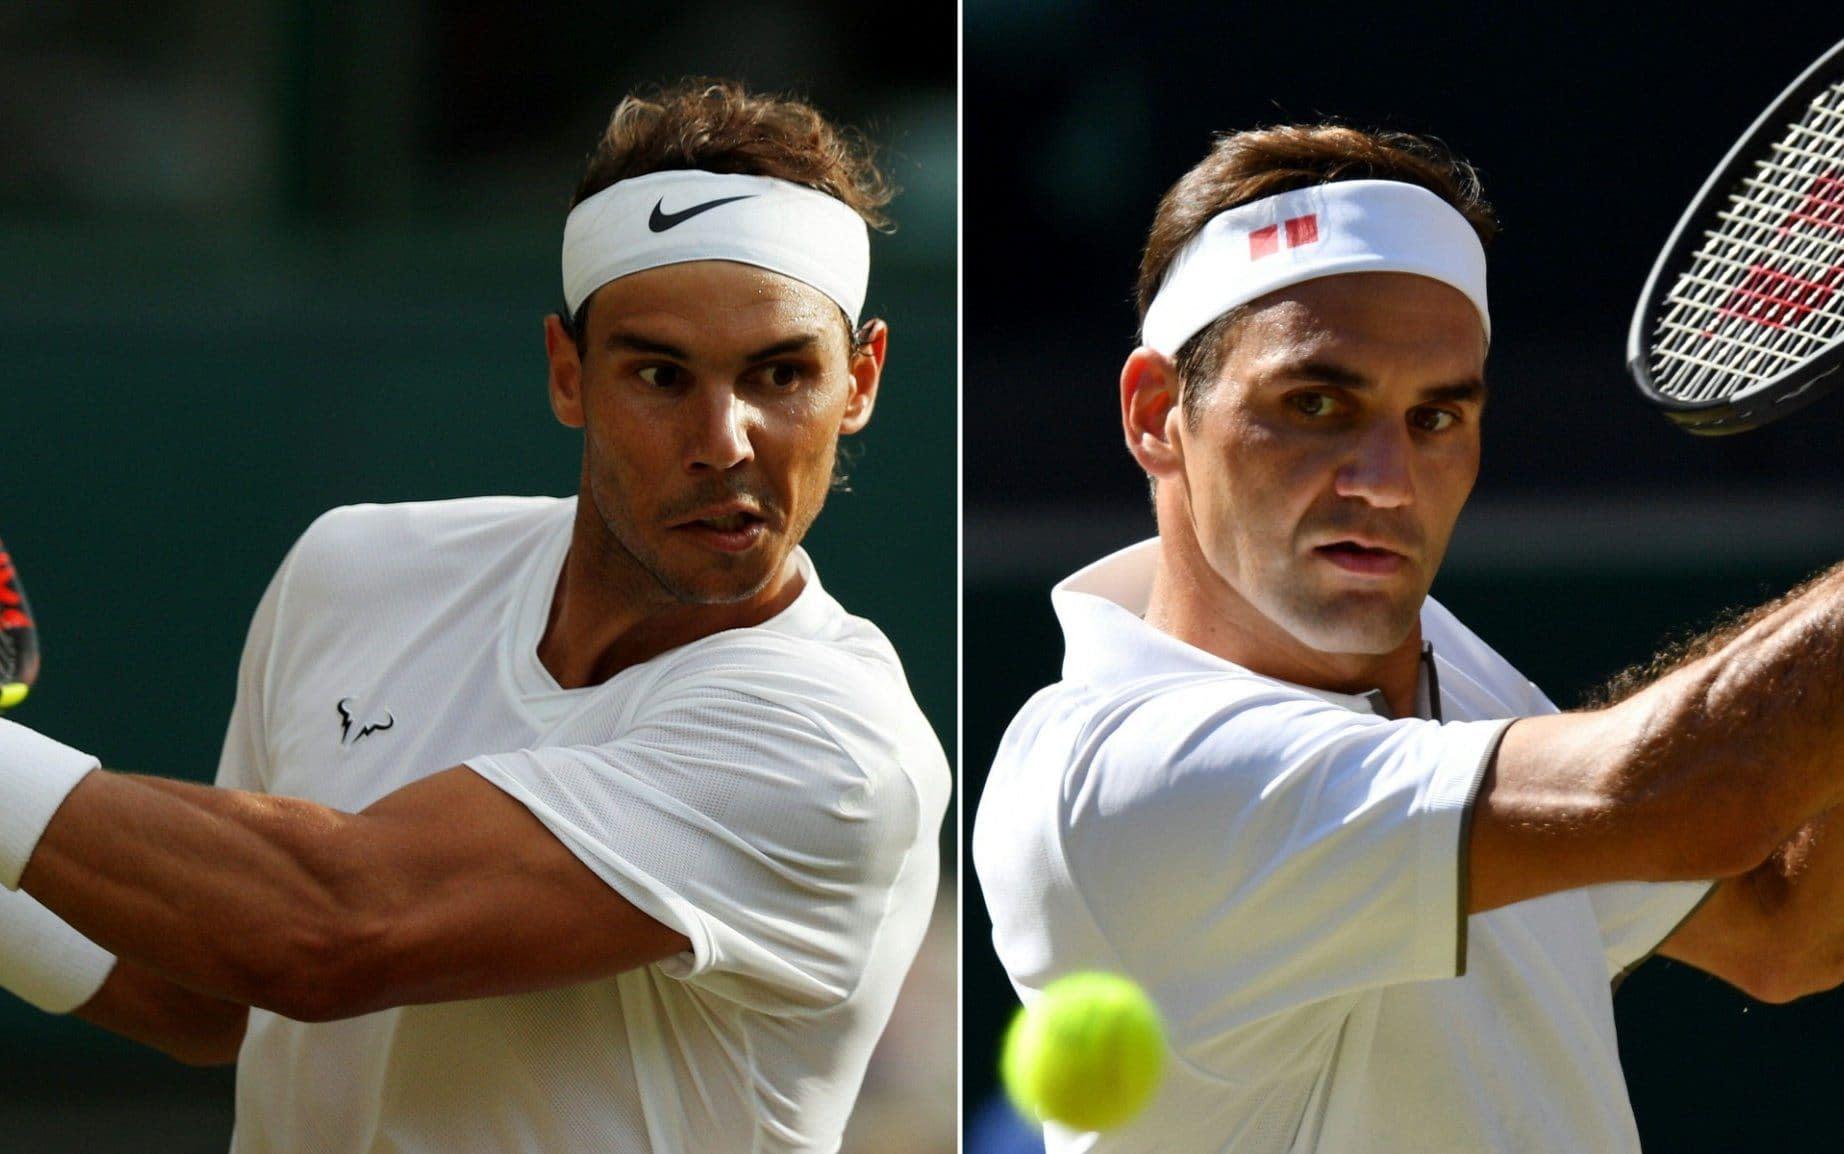 Roger Federer vs Rafael Nadal; the old dogs are still learning new tricks in battle for global supremacy